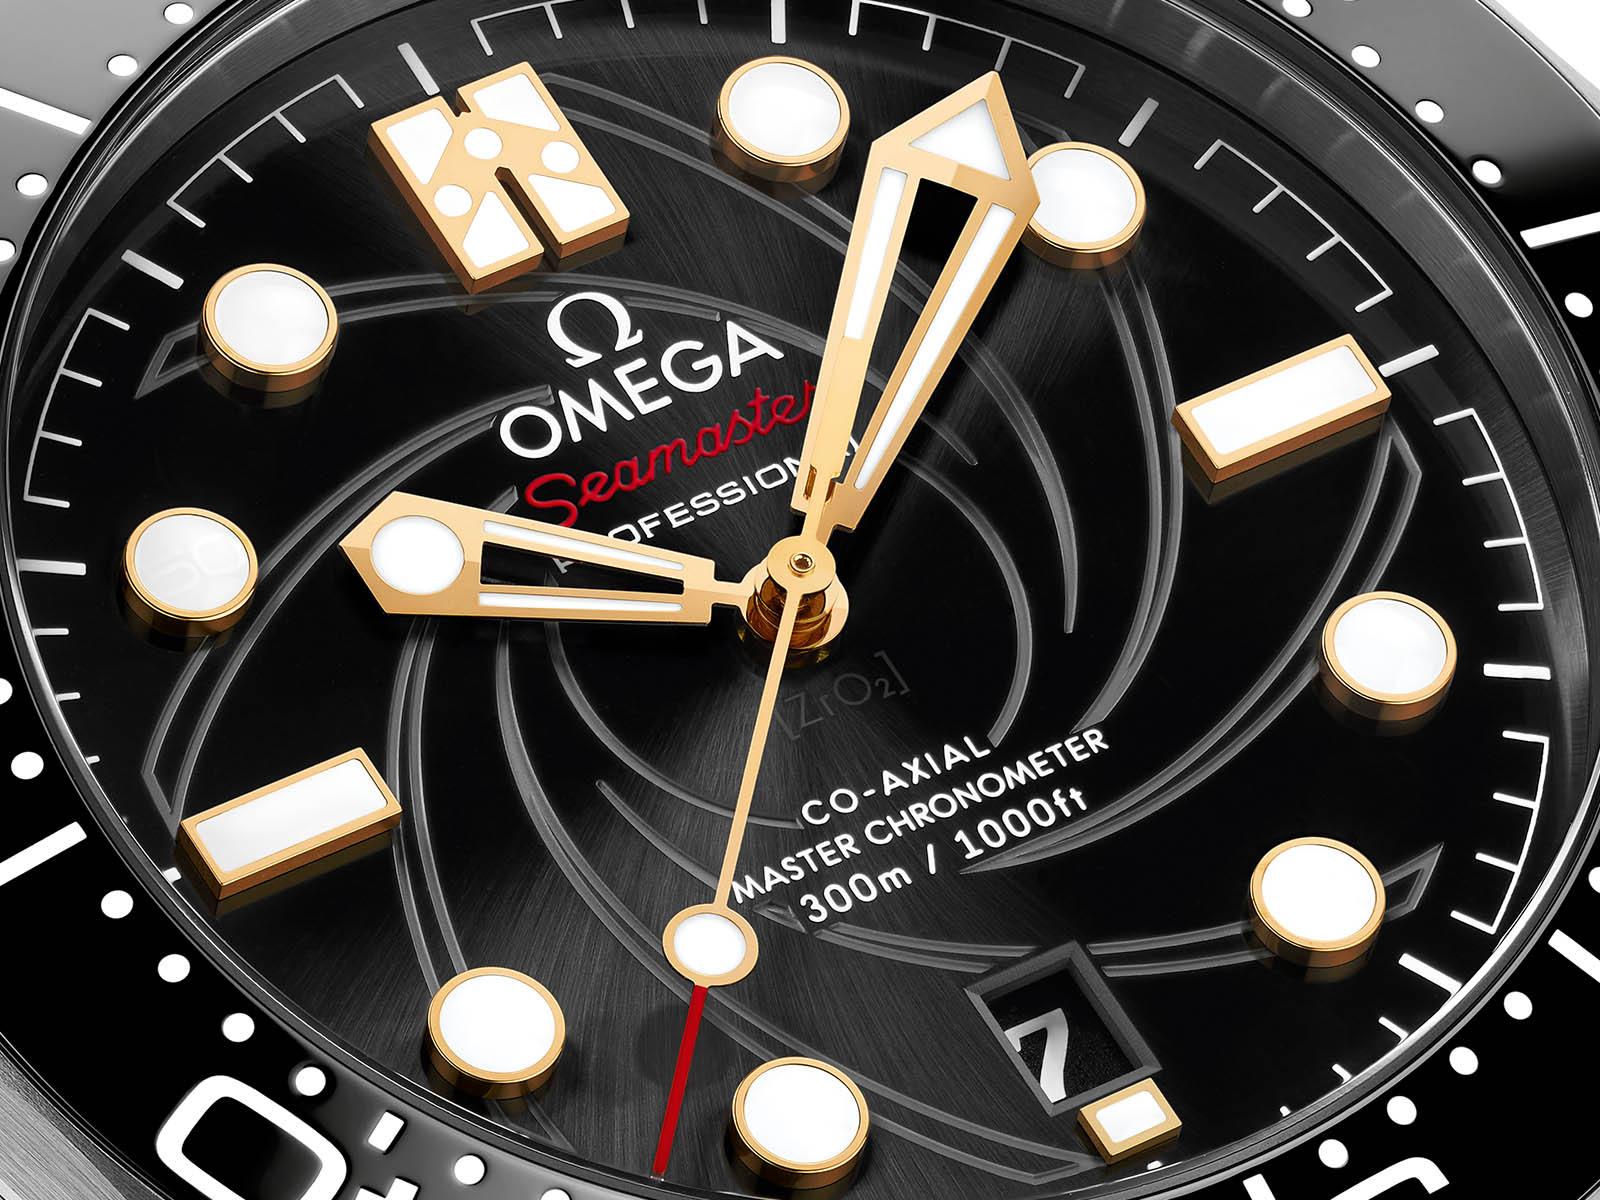 210-22-42-20-01-004-omega-seamaster-300m-diver-007-5-.jpg